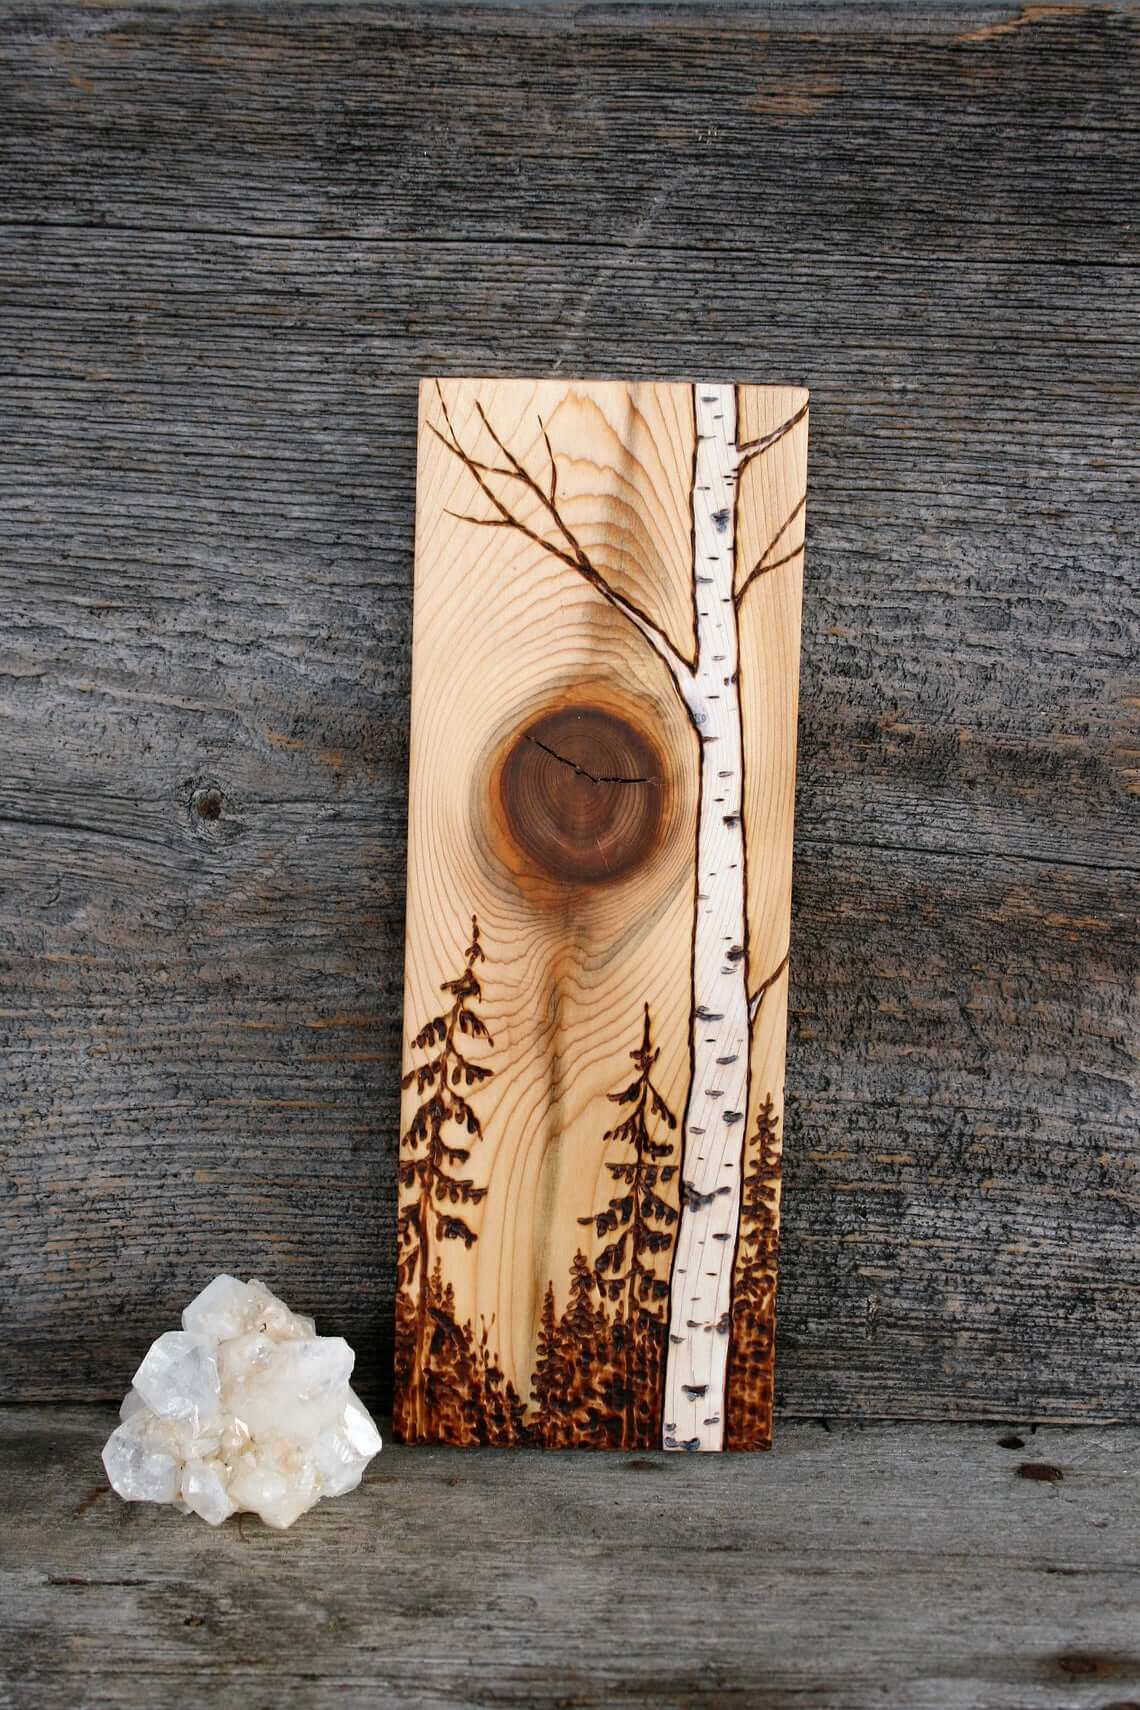 Wood Burned Glowing Sun Art Piece